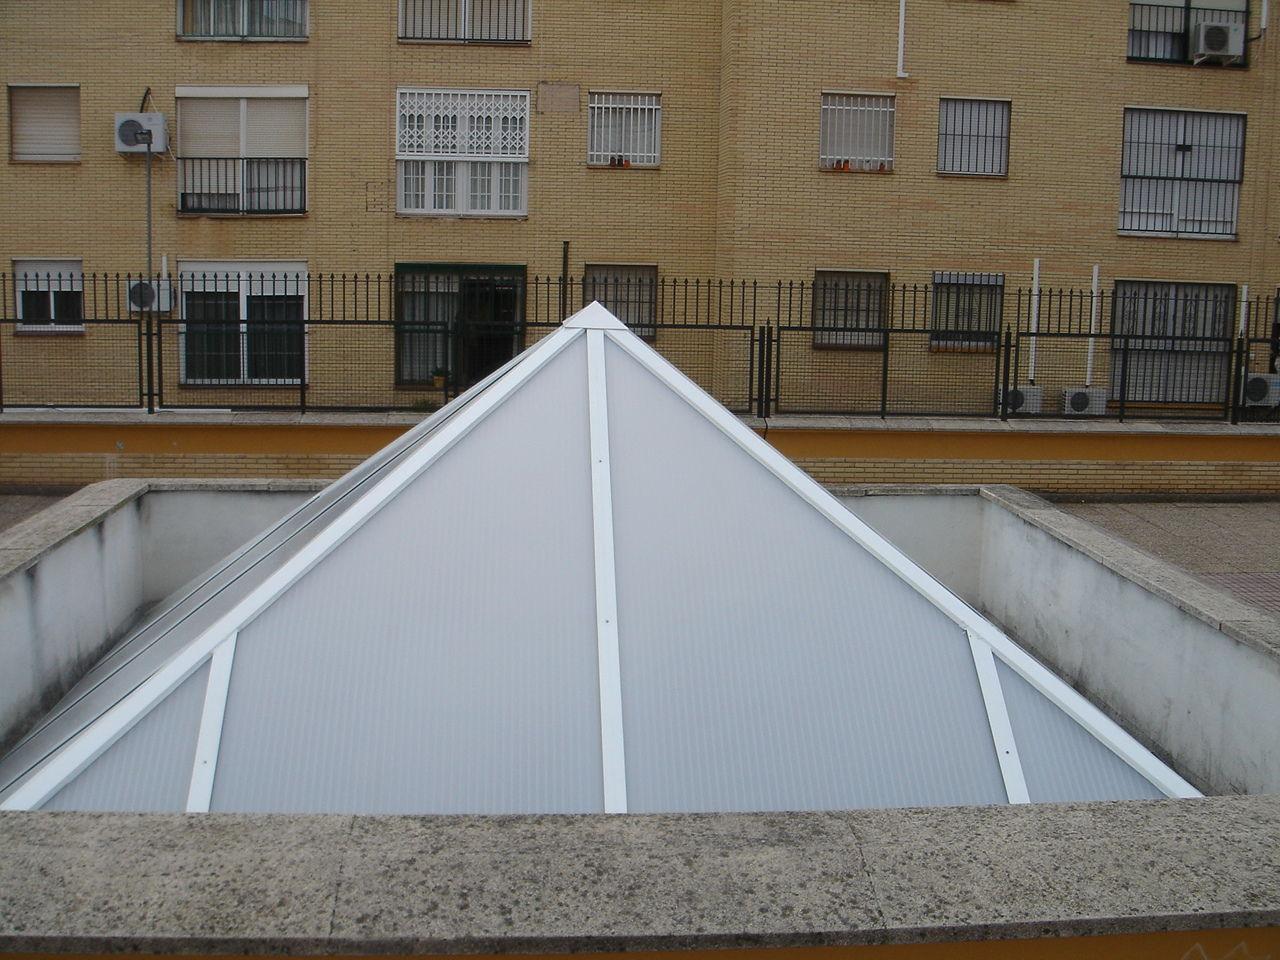 Foto 15 de Carpintería de aluminio, metálica y PVC en Málaga | Aluminios Alunoe